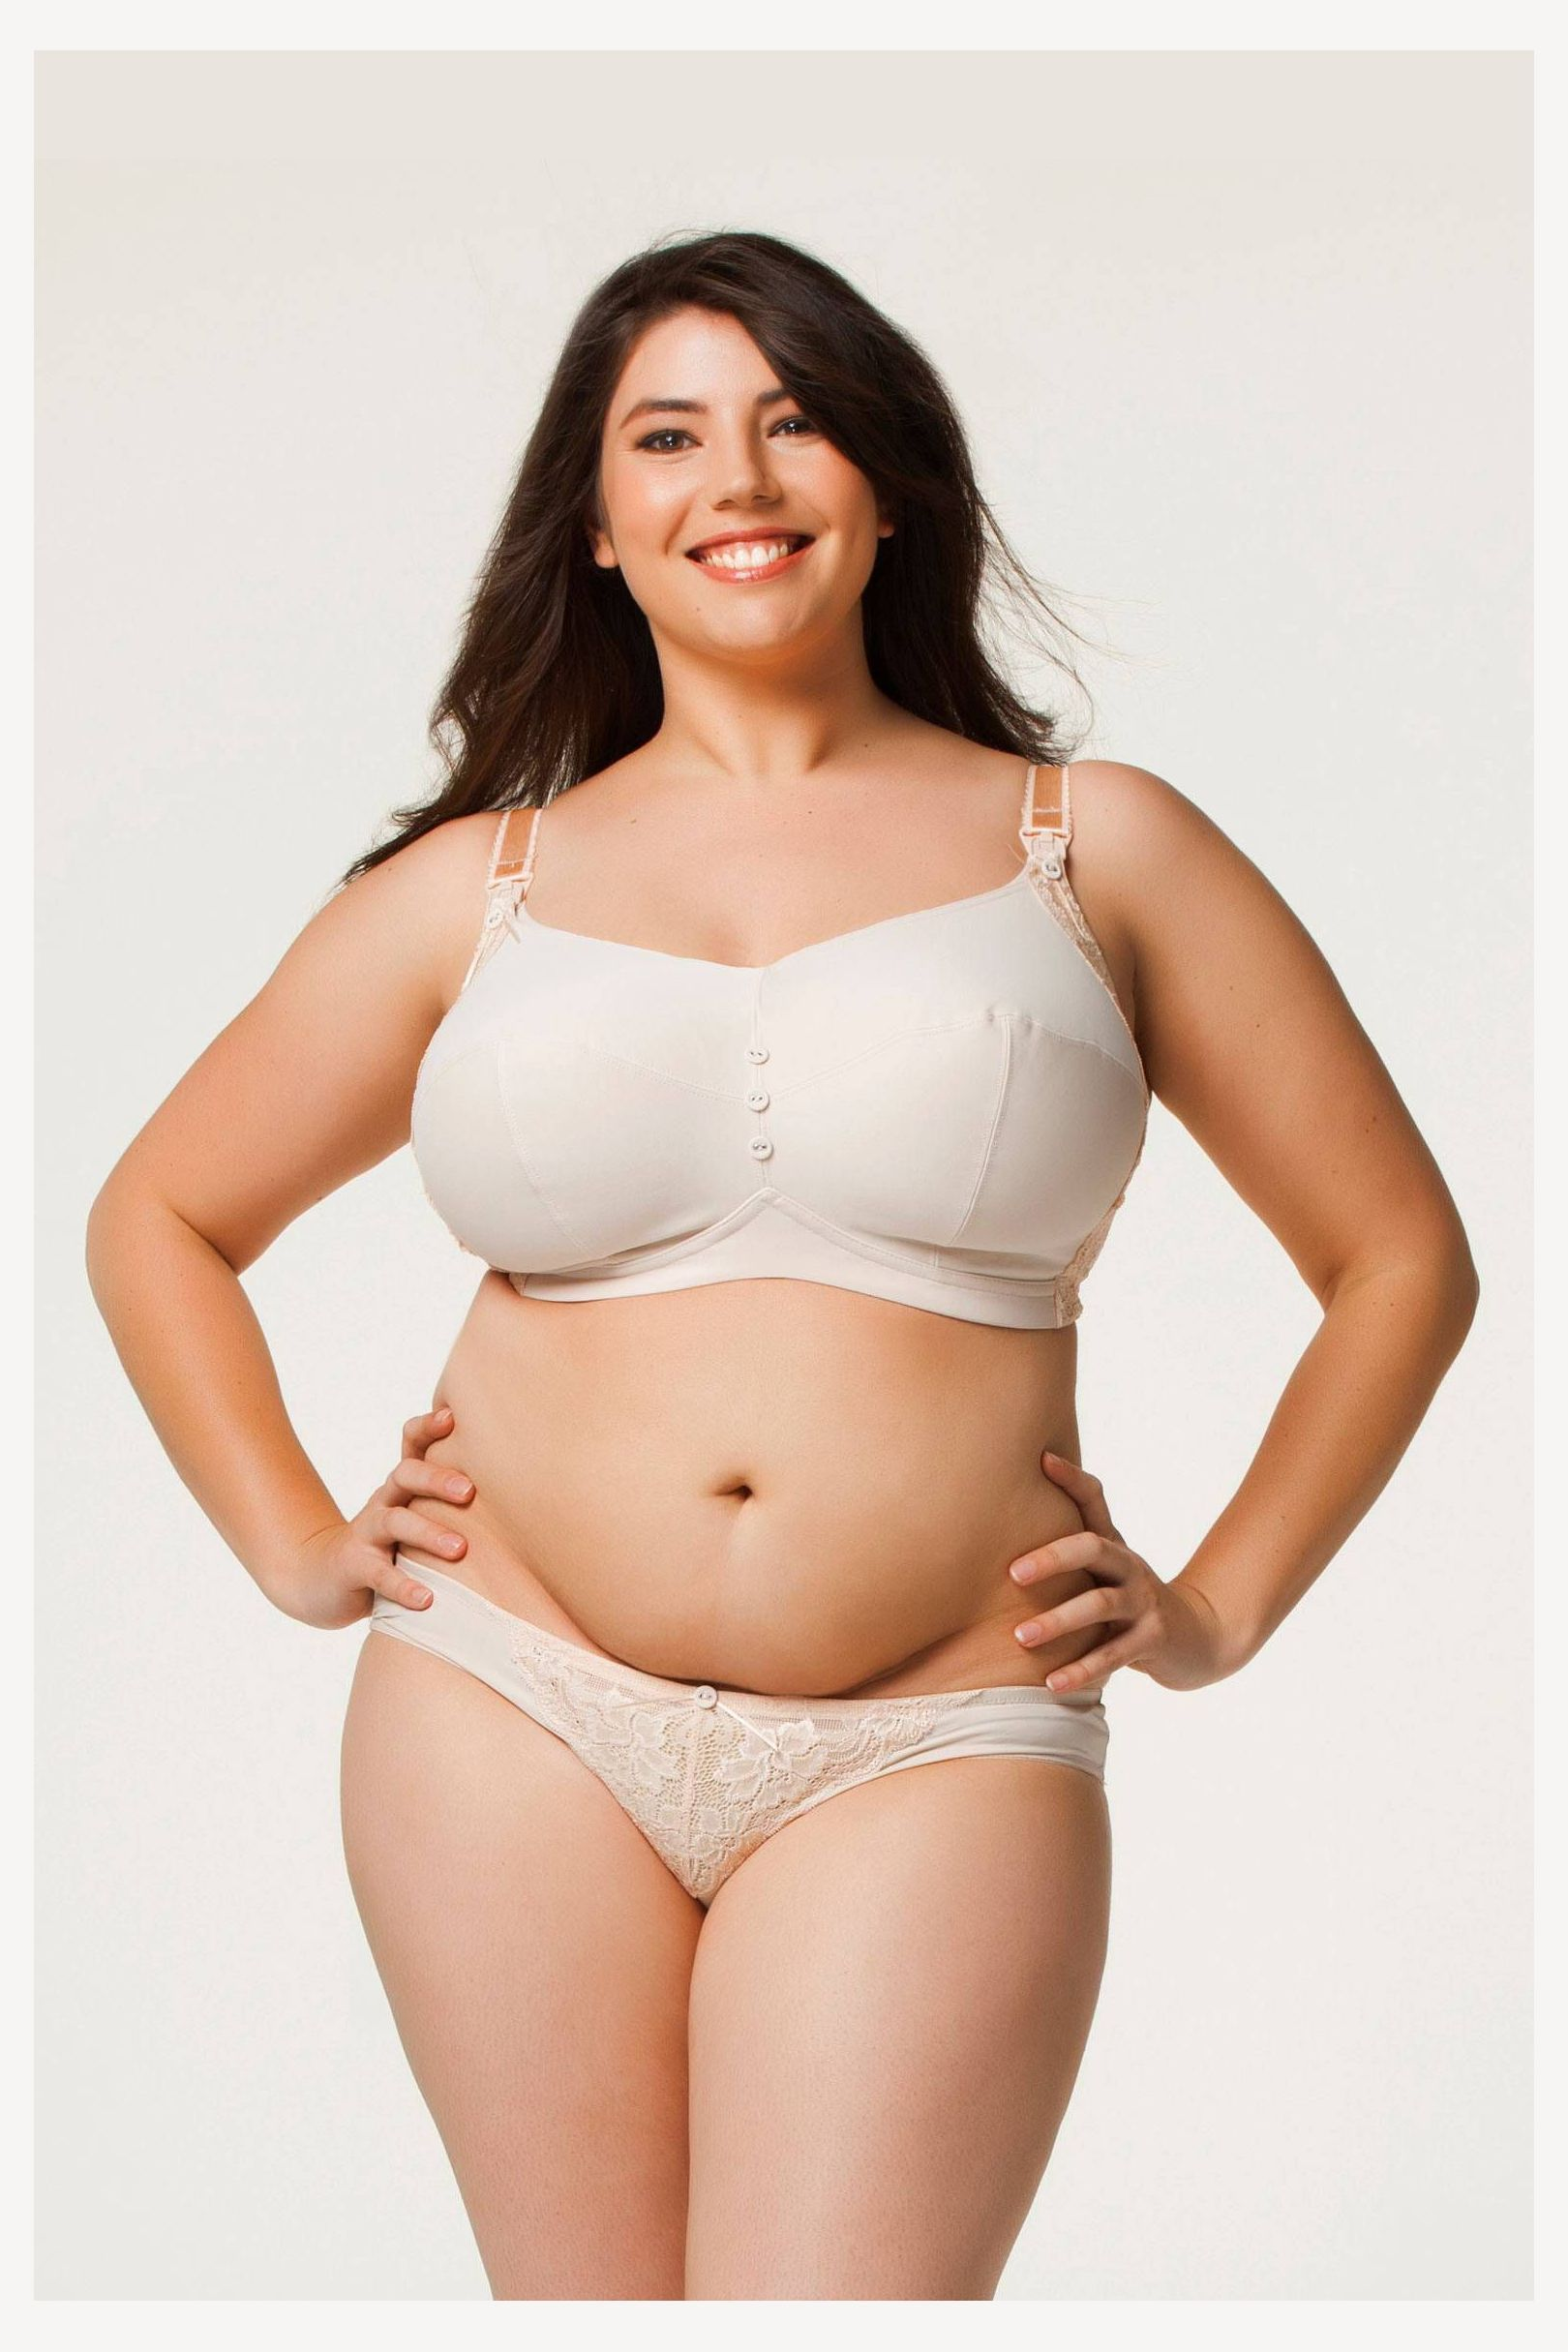 Sorbet Plus Size Non Wire Nursing Bra | Large Breasts, Macromastia ...